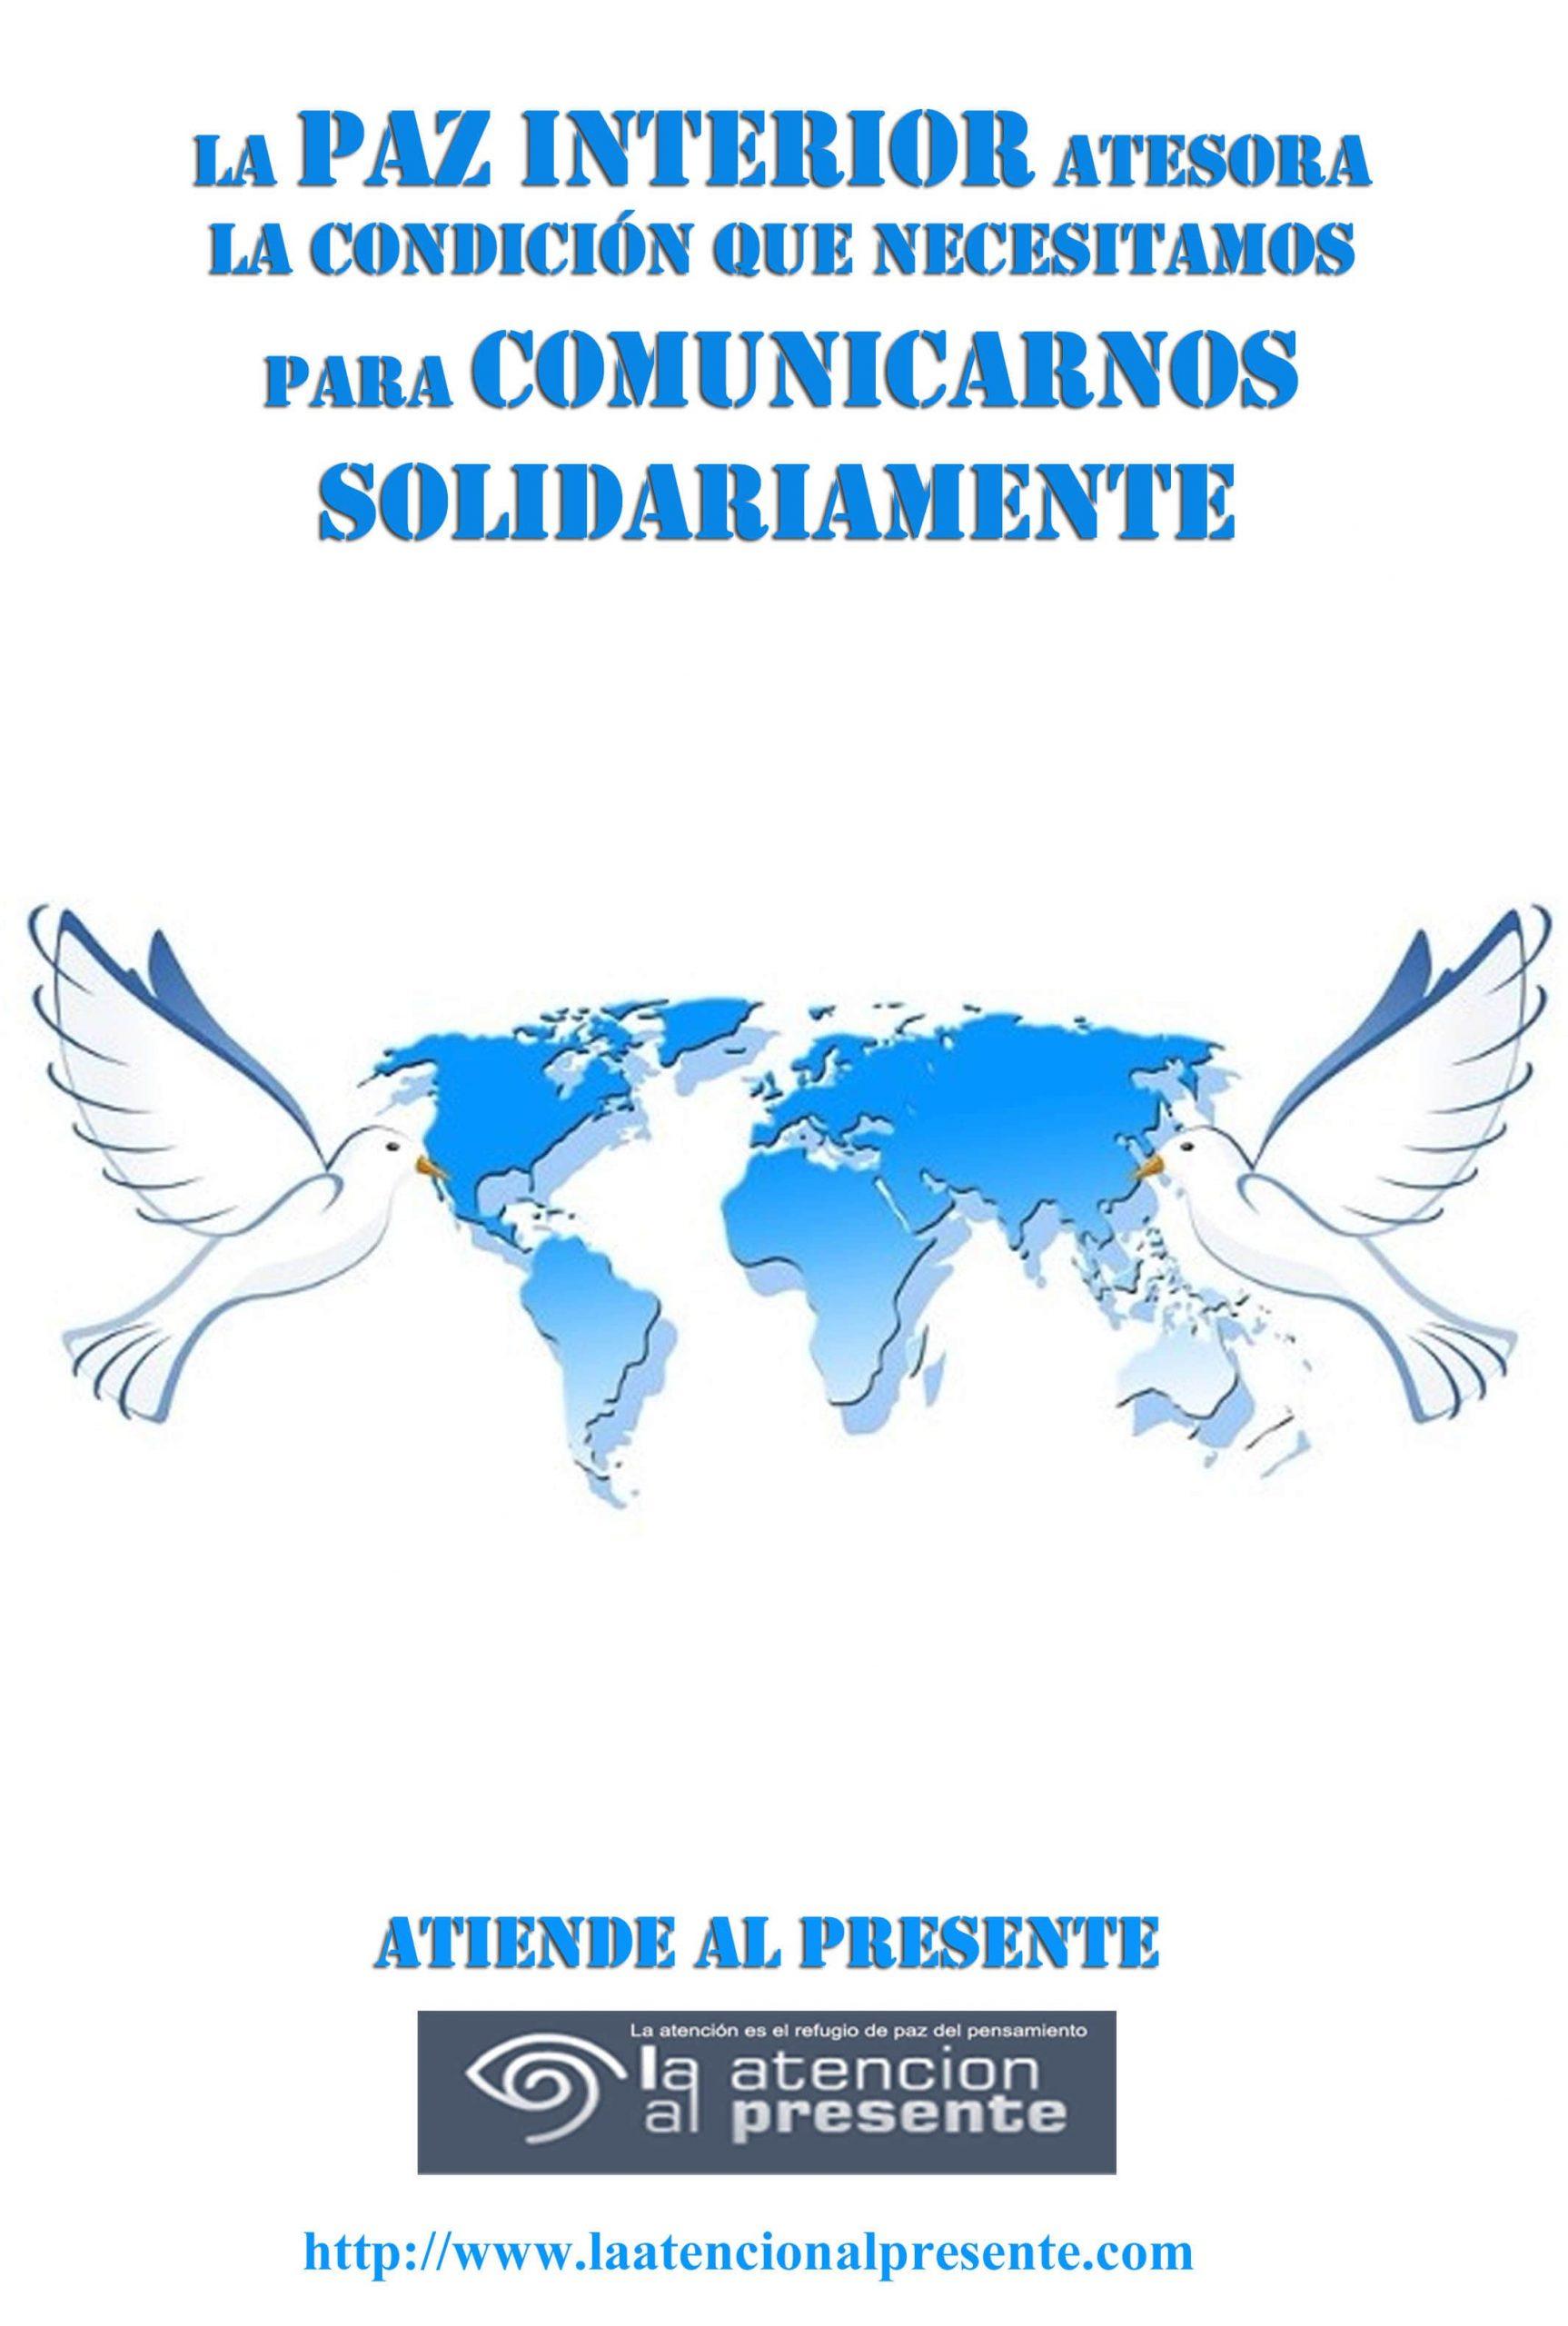 20 de diciembre Esteban La Paz interior atesora la condición que necesitamos para comunicarnos significativamente min scaled